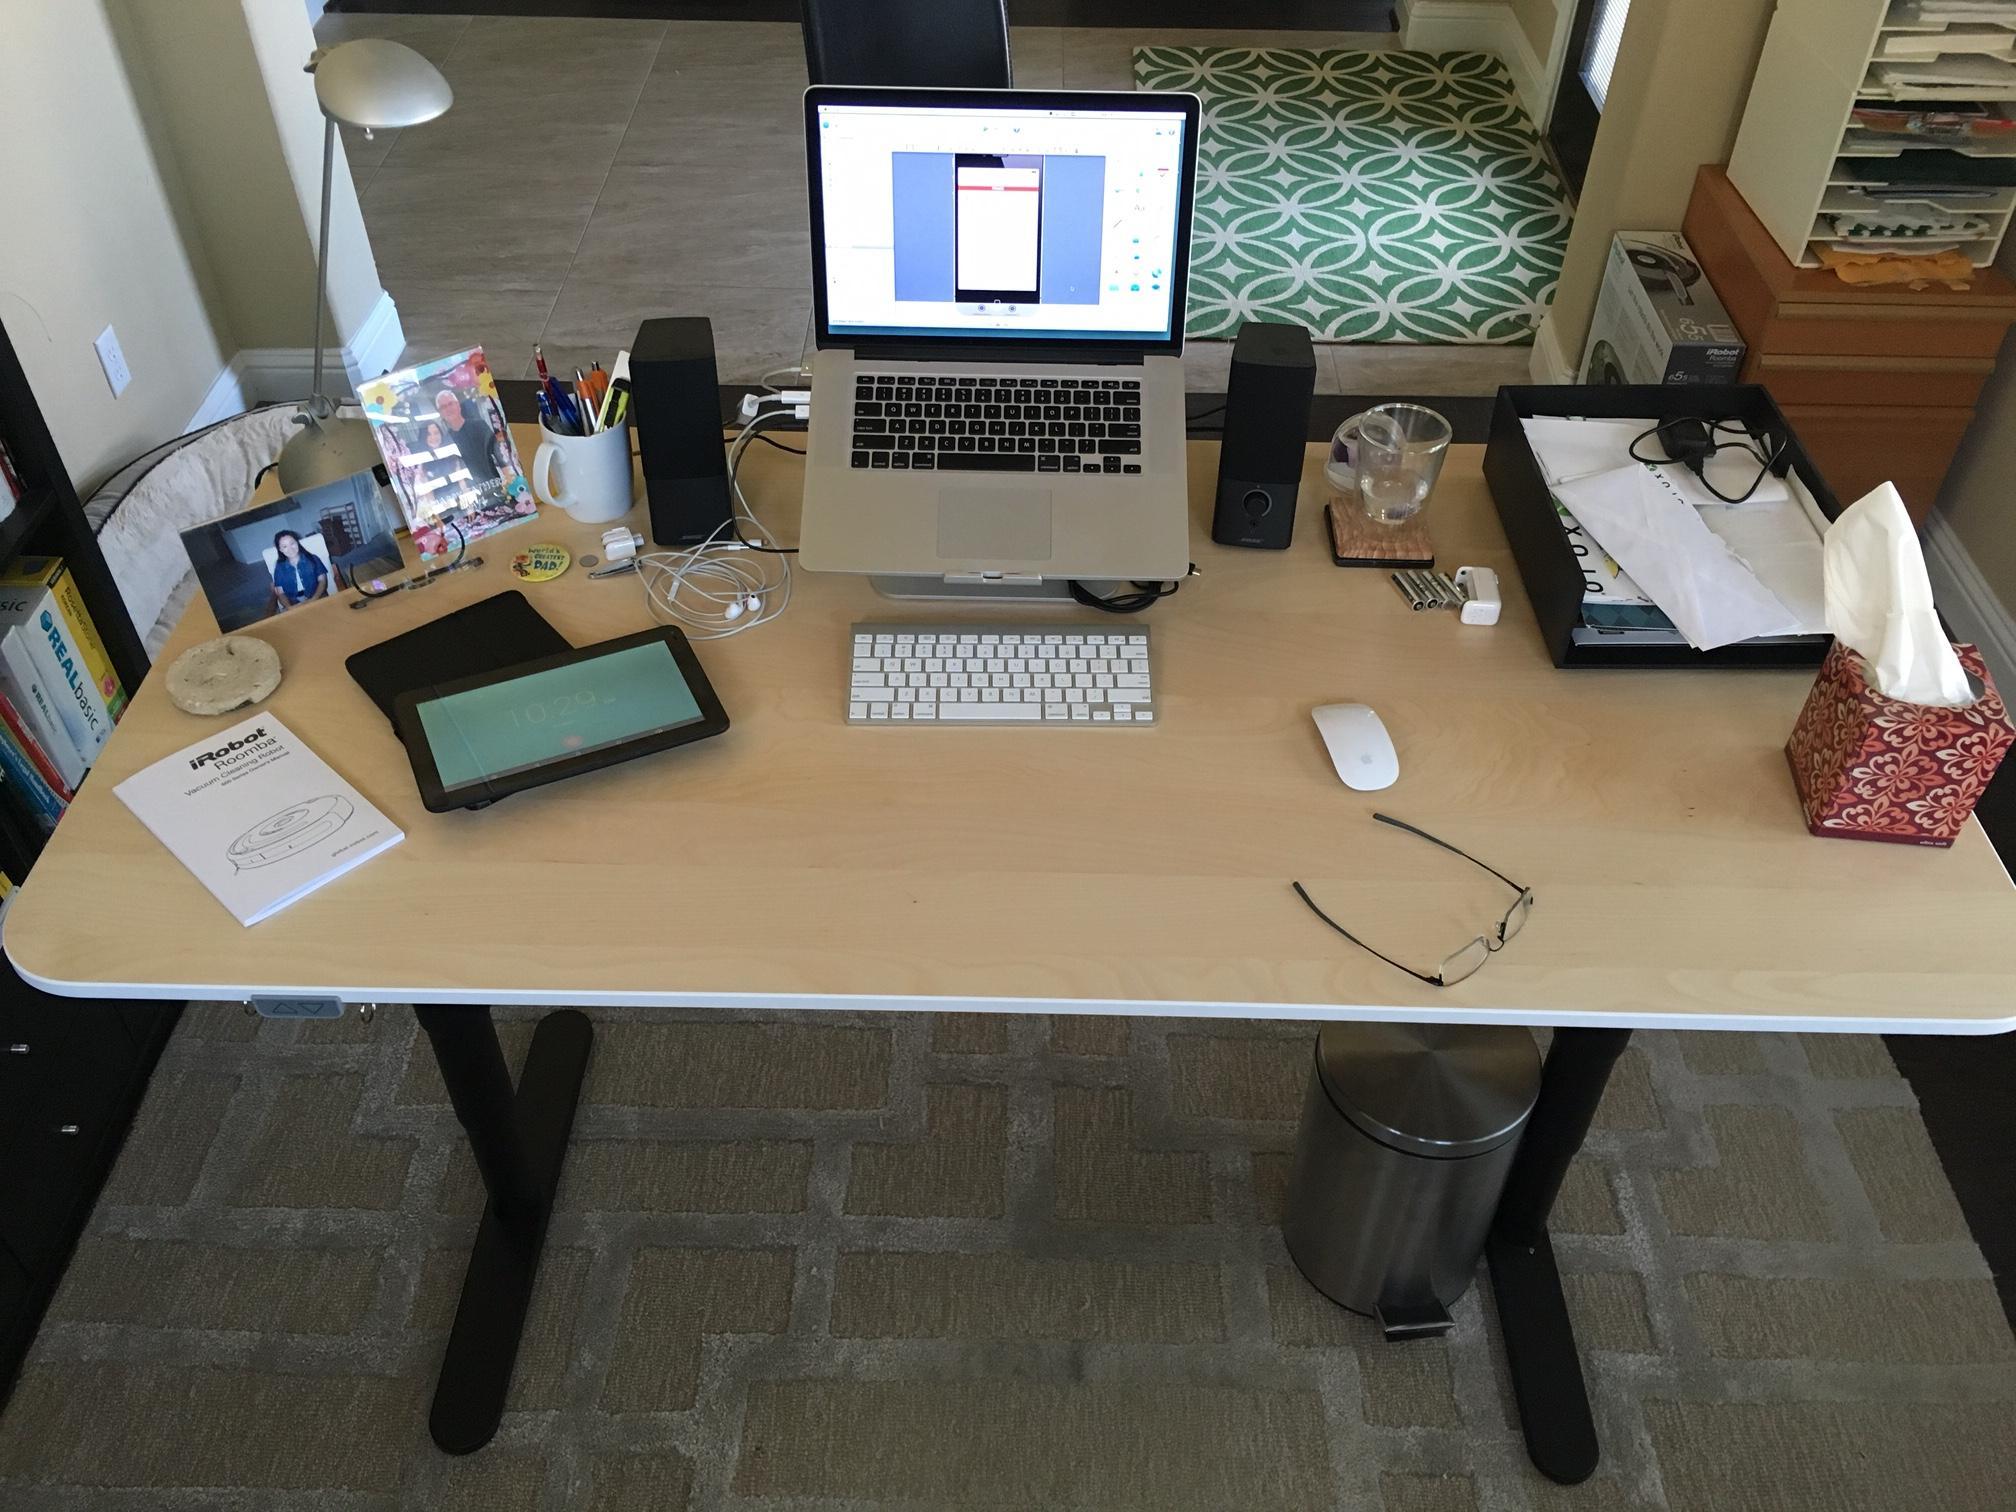 Geoff_Desk.jpg